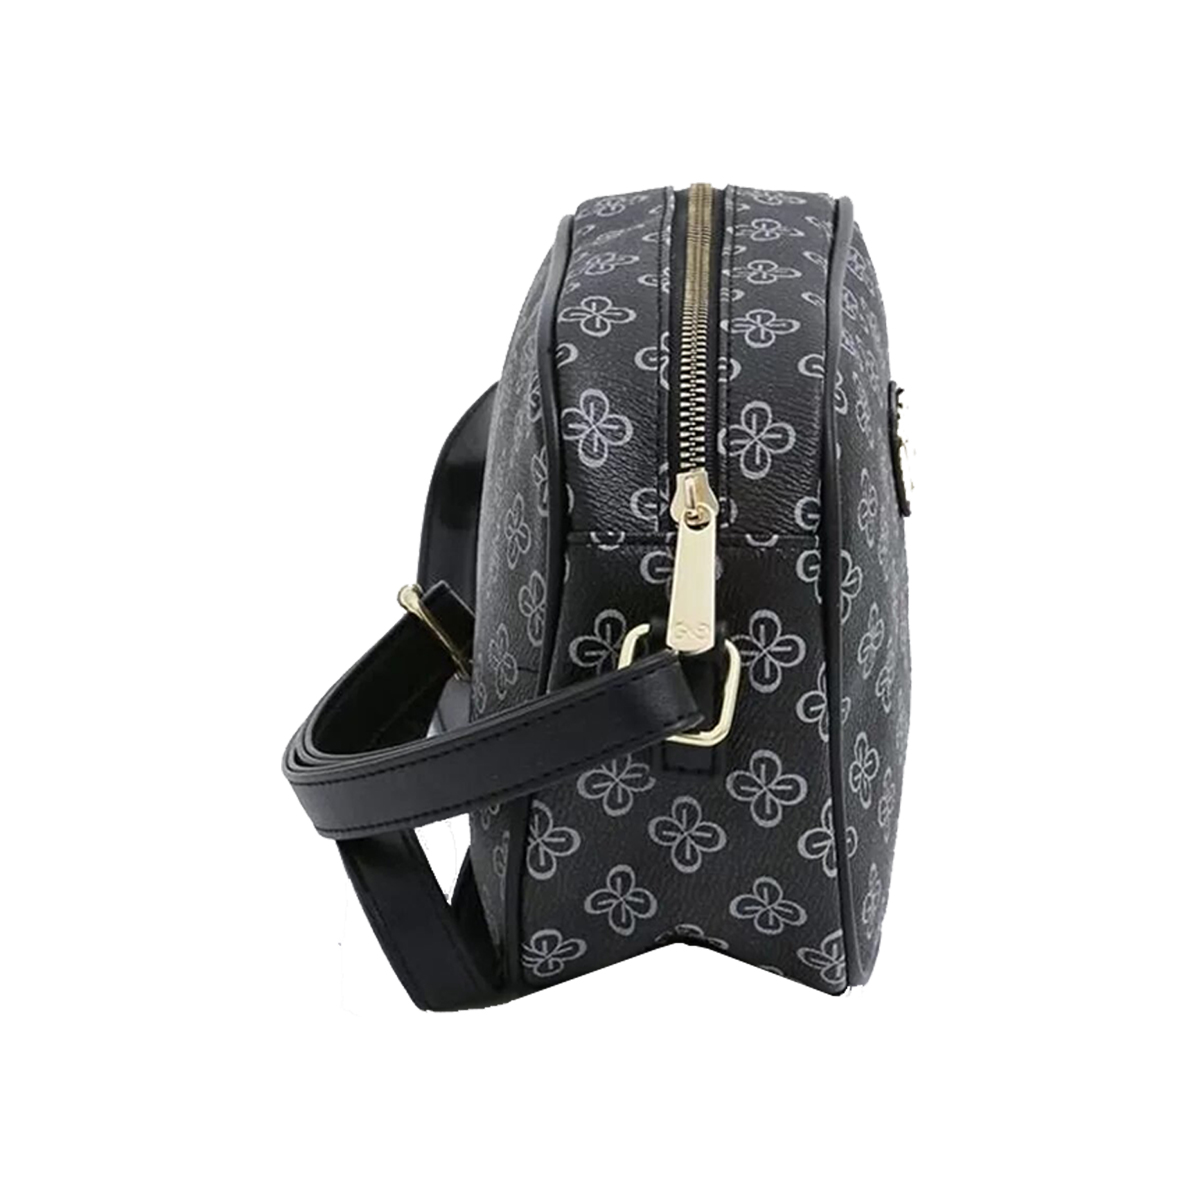 Bolsa Pequena Feminina Gash Transversal Estampada Original